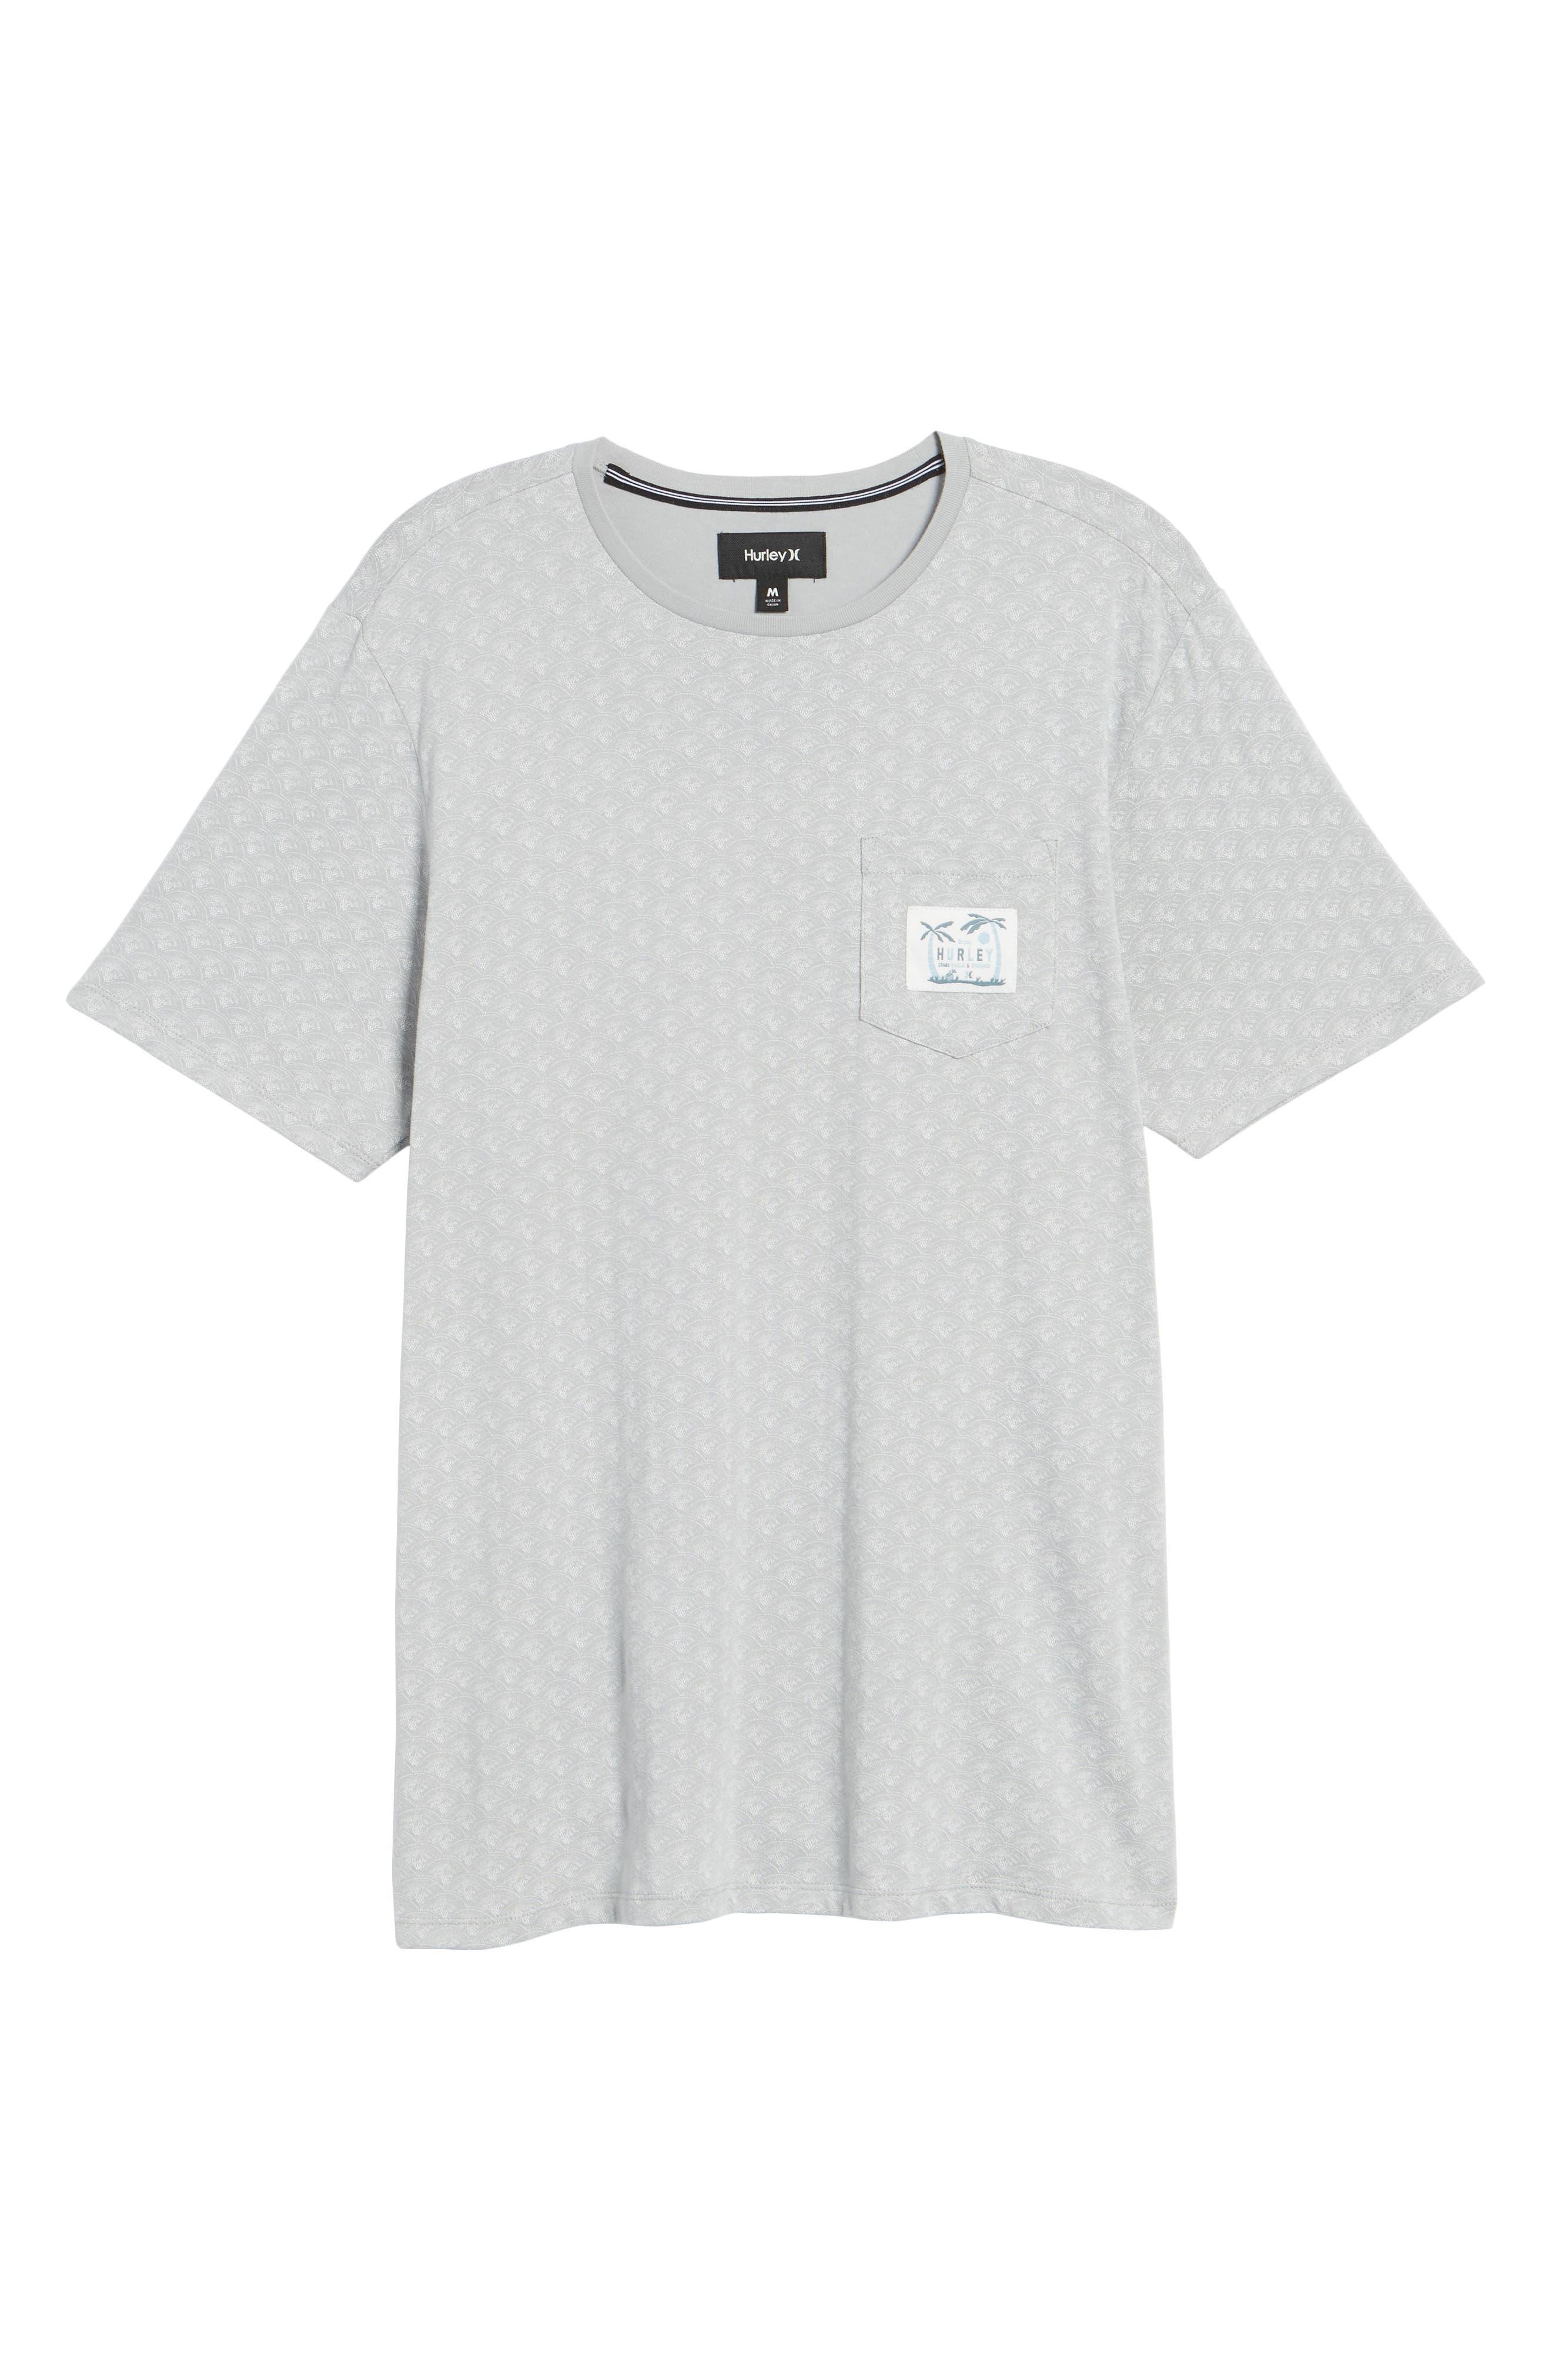 Pescado Short Sleeve T-Shirt,                             Alternate thumbnail 6, color,                             133